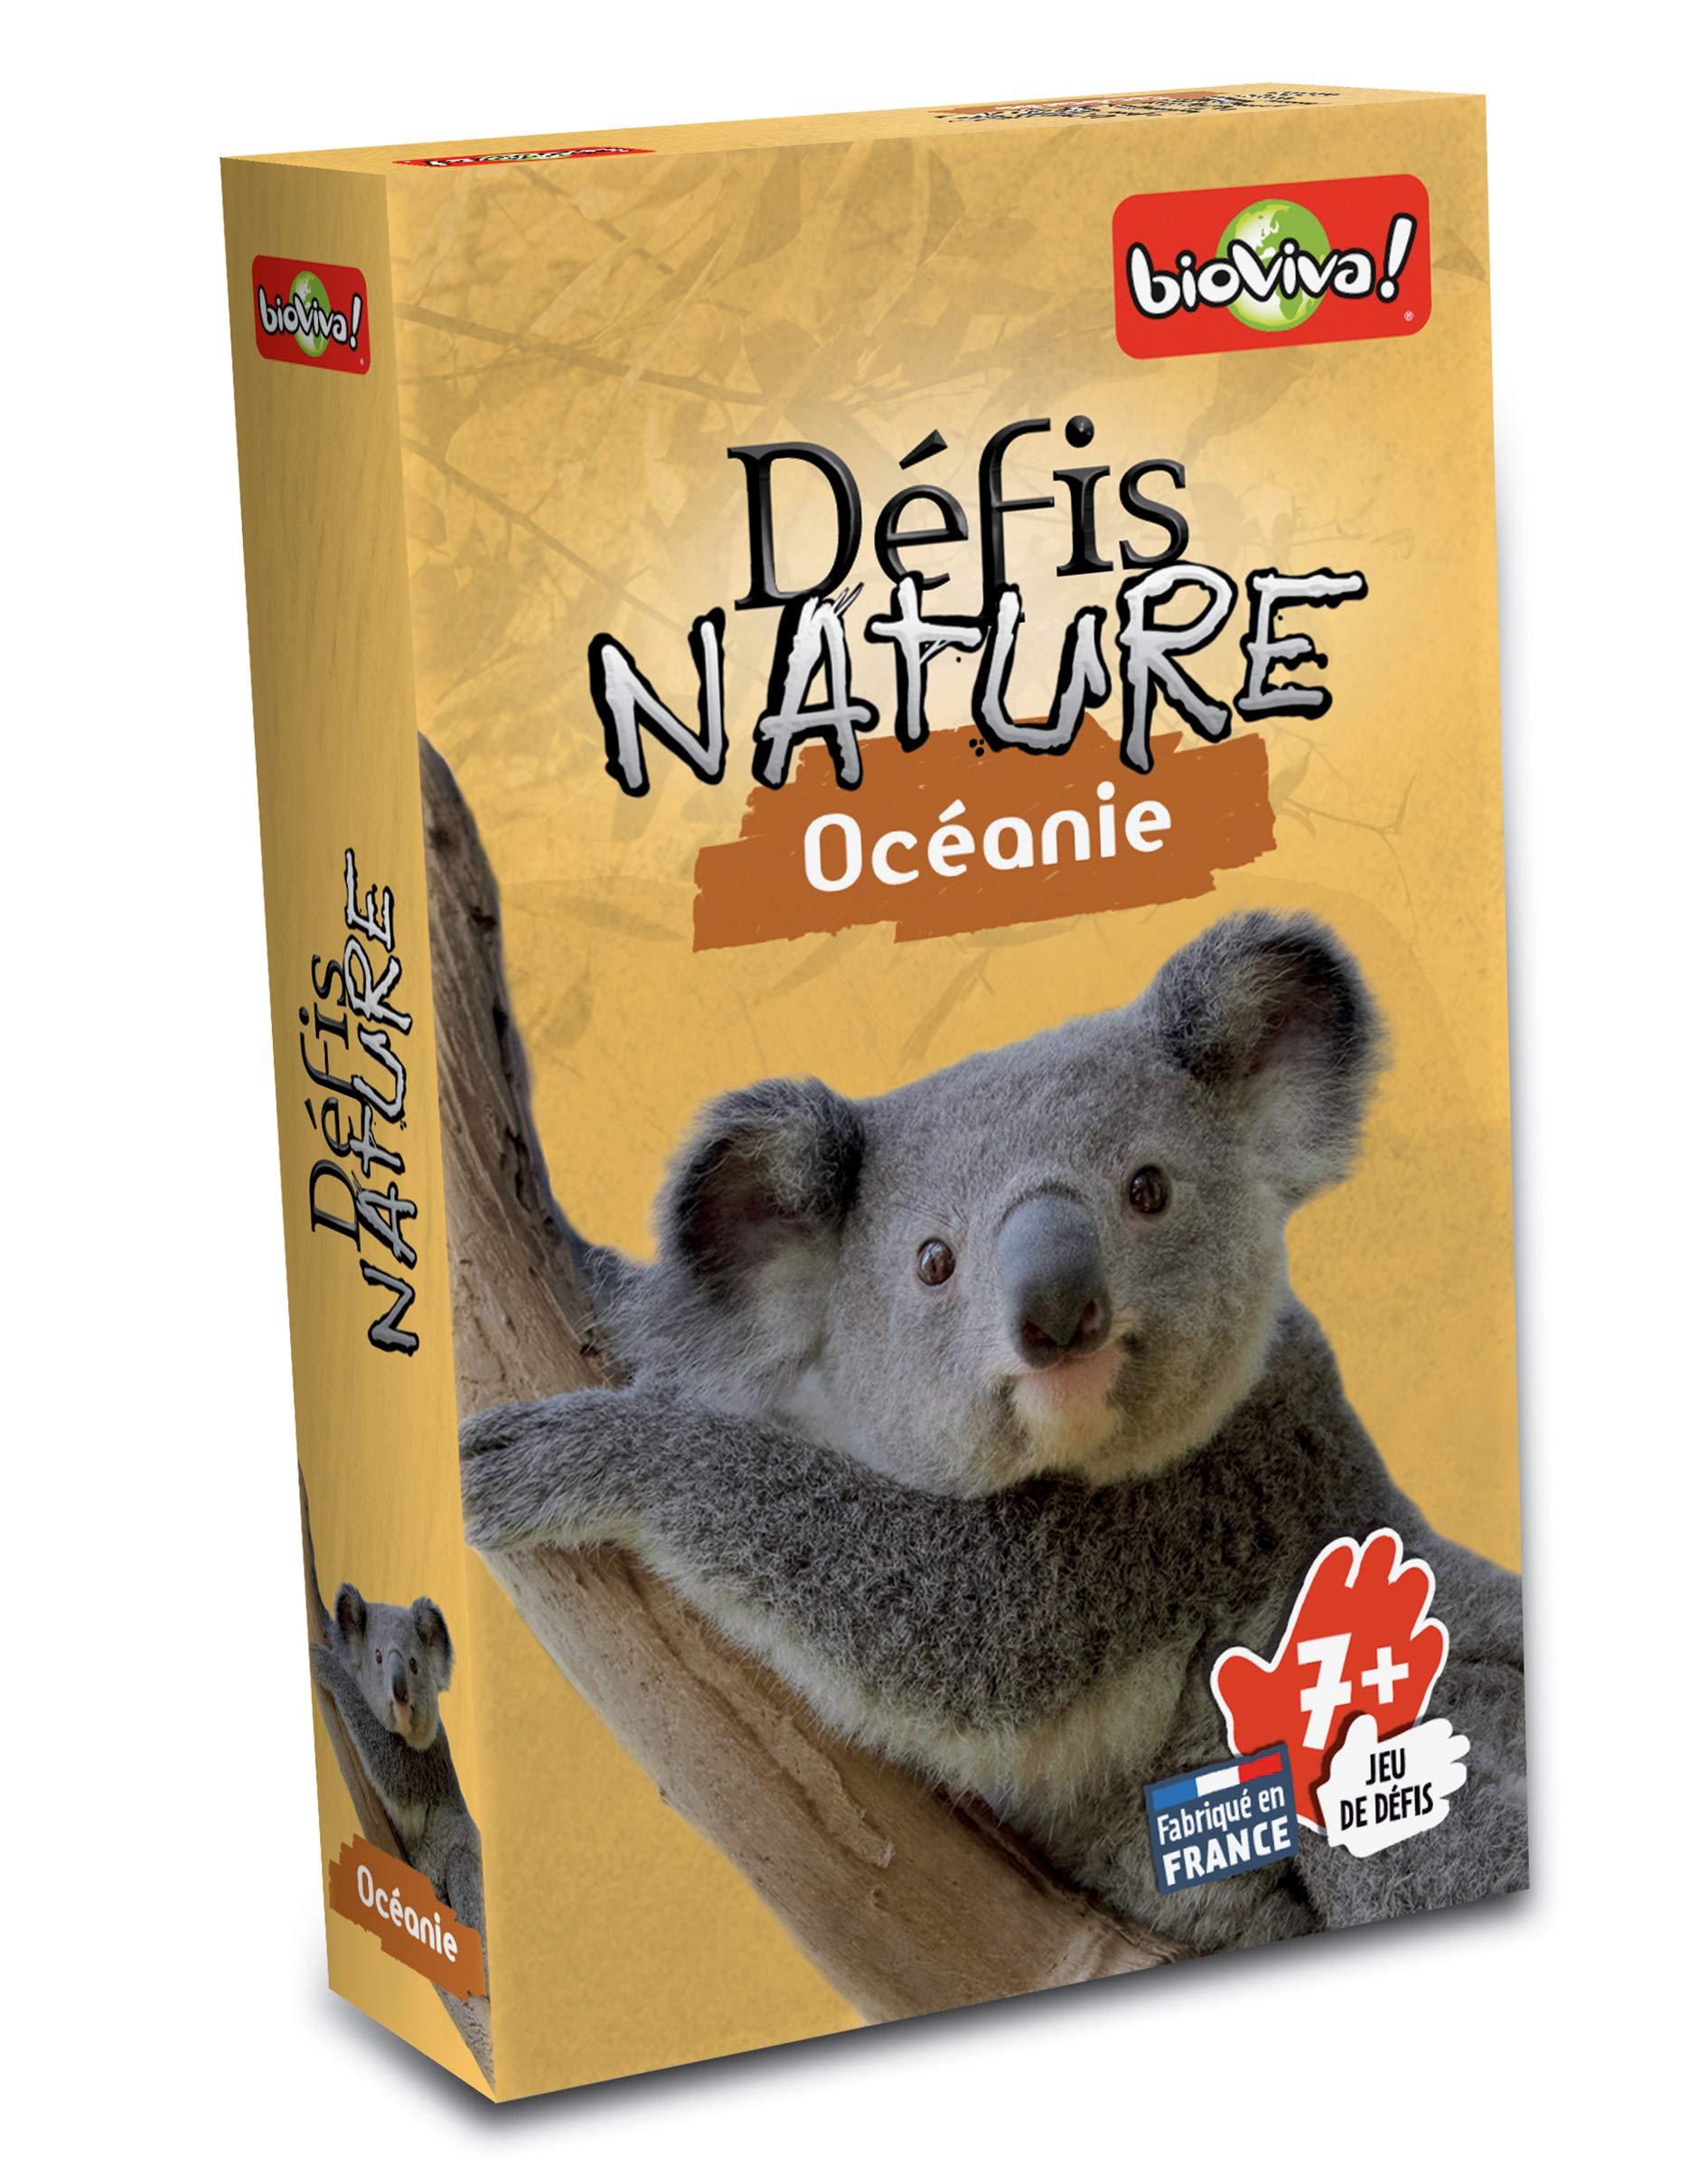 Defis Nature Oceanie by Bioviva